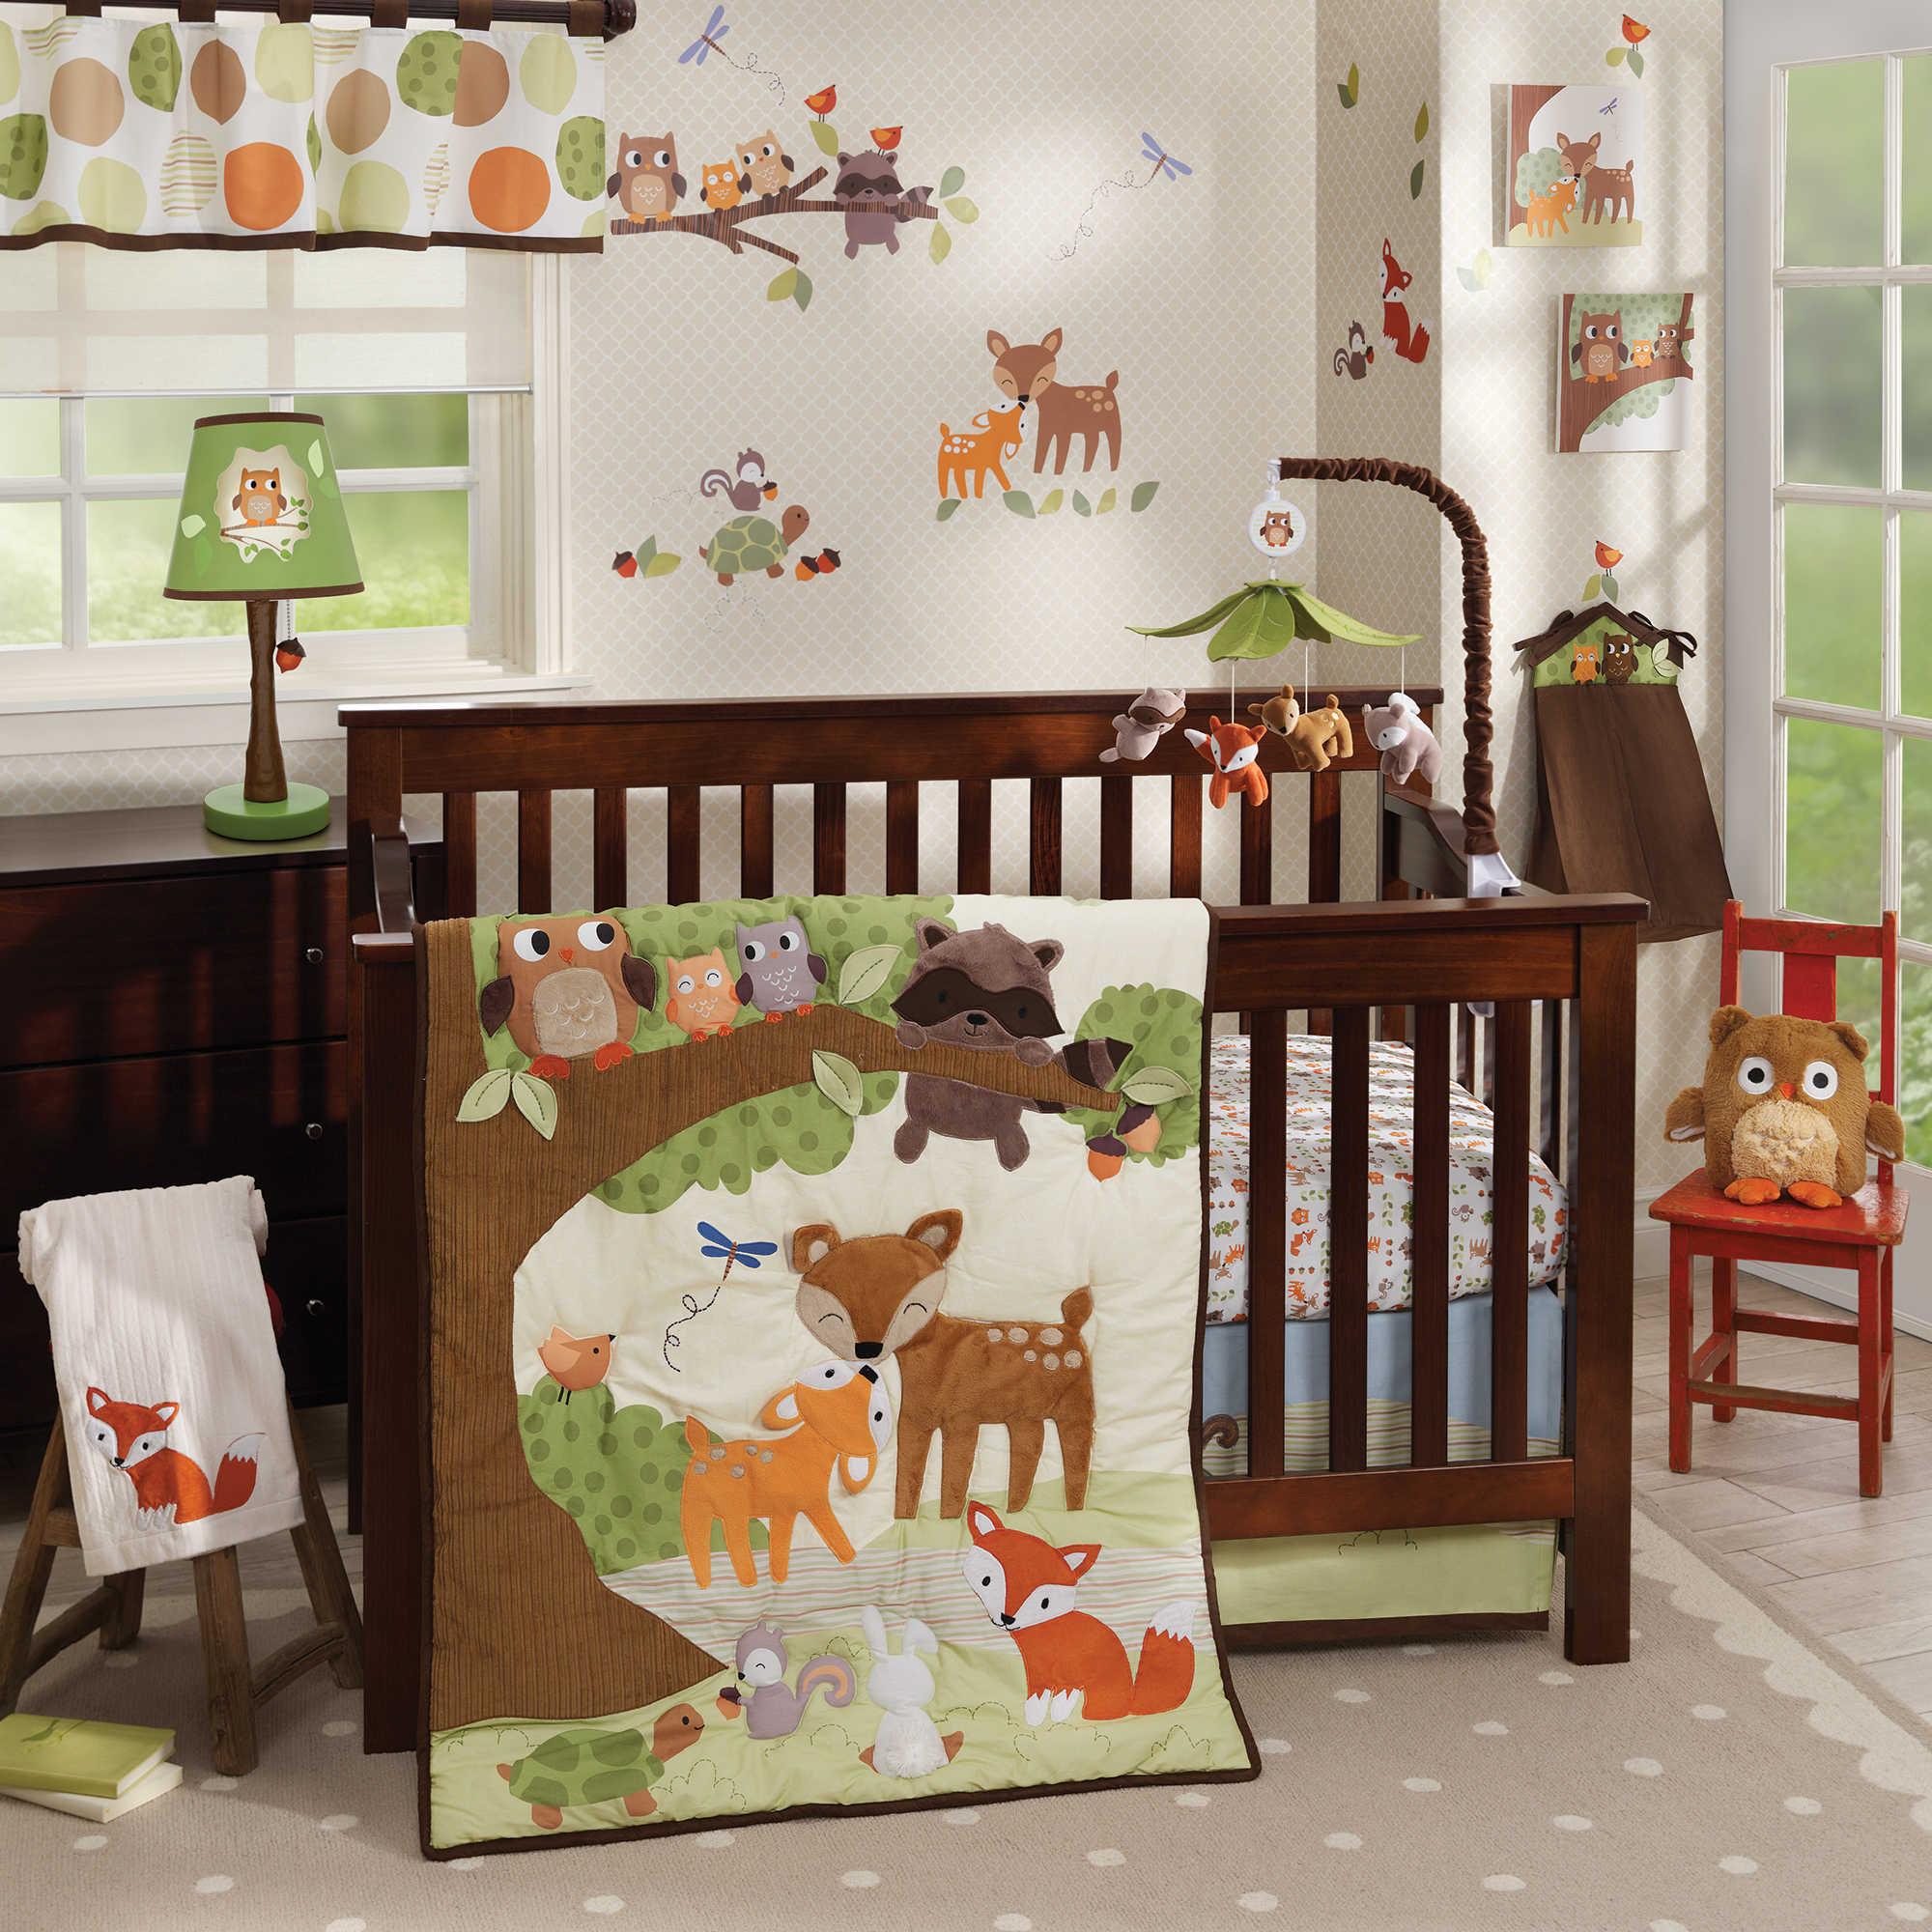 Baby cribs buy buy baby - Lambs Ivy Reg Woodland Tales Crib Bedding Collection